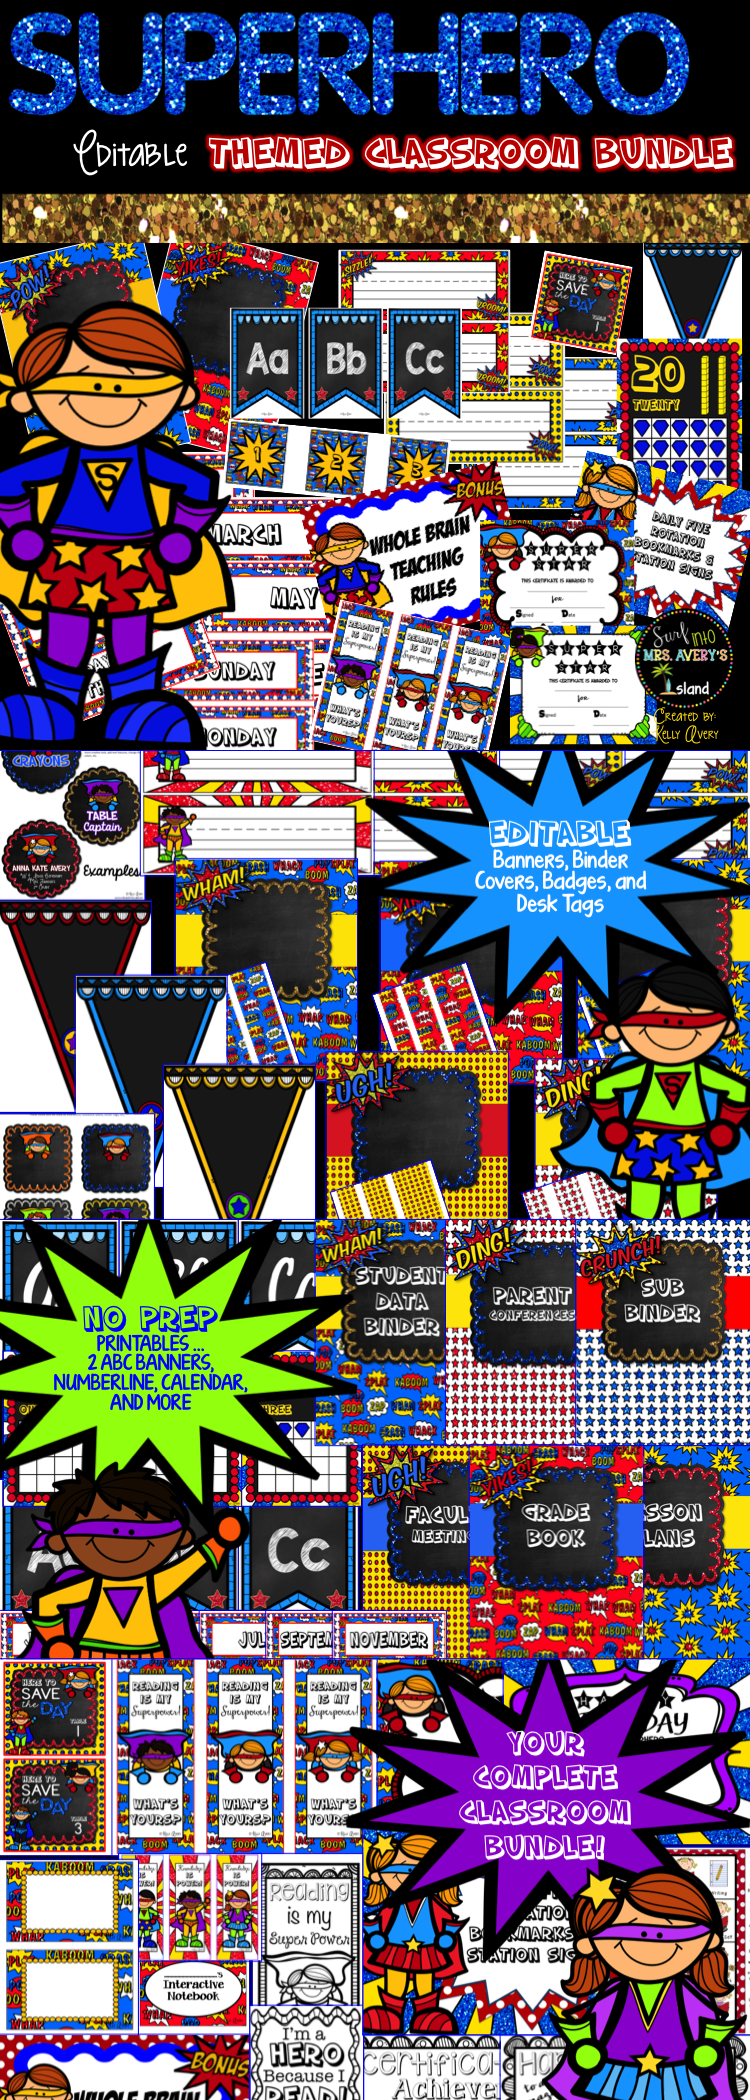 Classroom Decor Bundles ~ This superhero classroom bundle is full of editable